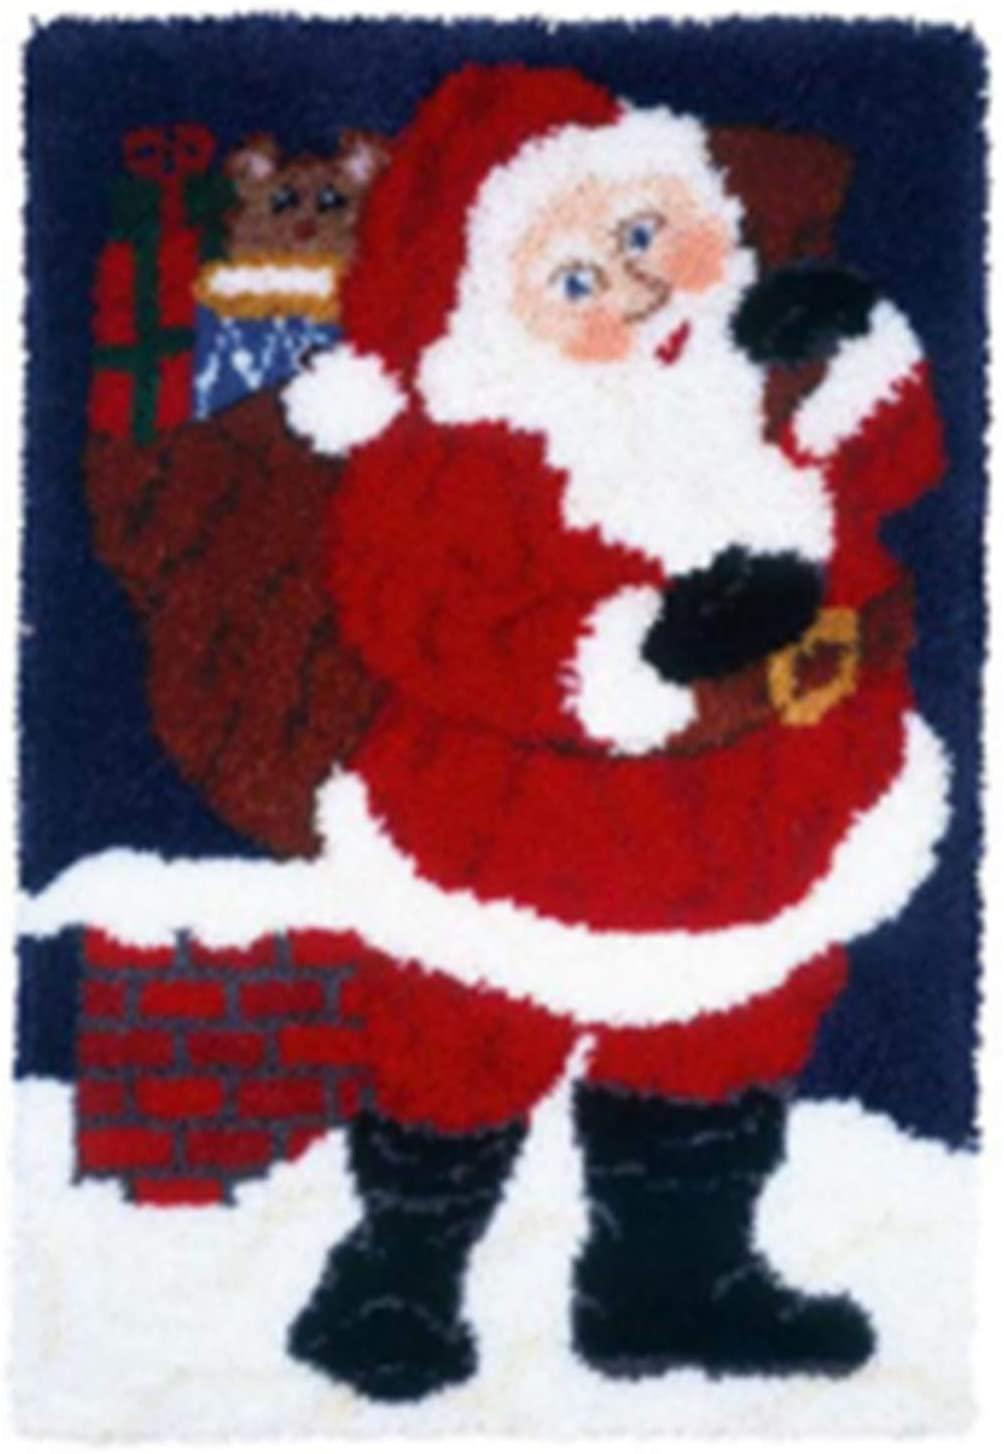 QJBMEI Latch Hook Kits Crochet Yarn Kits, DIY Crocheting Santa Pattern Rug Cushion Embroidery Carpet Set 33.8 × 23.2 Inch,Santa,8659CM